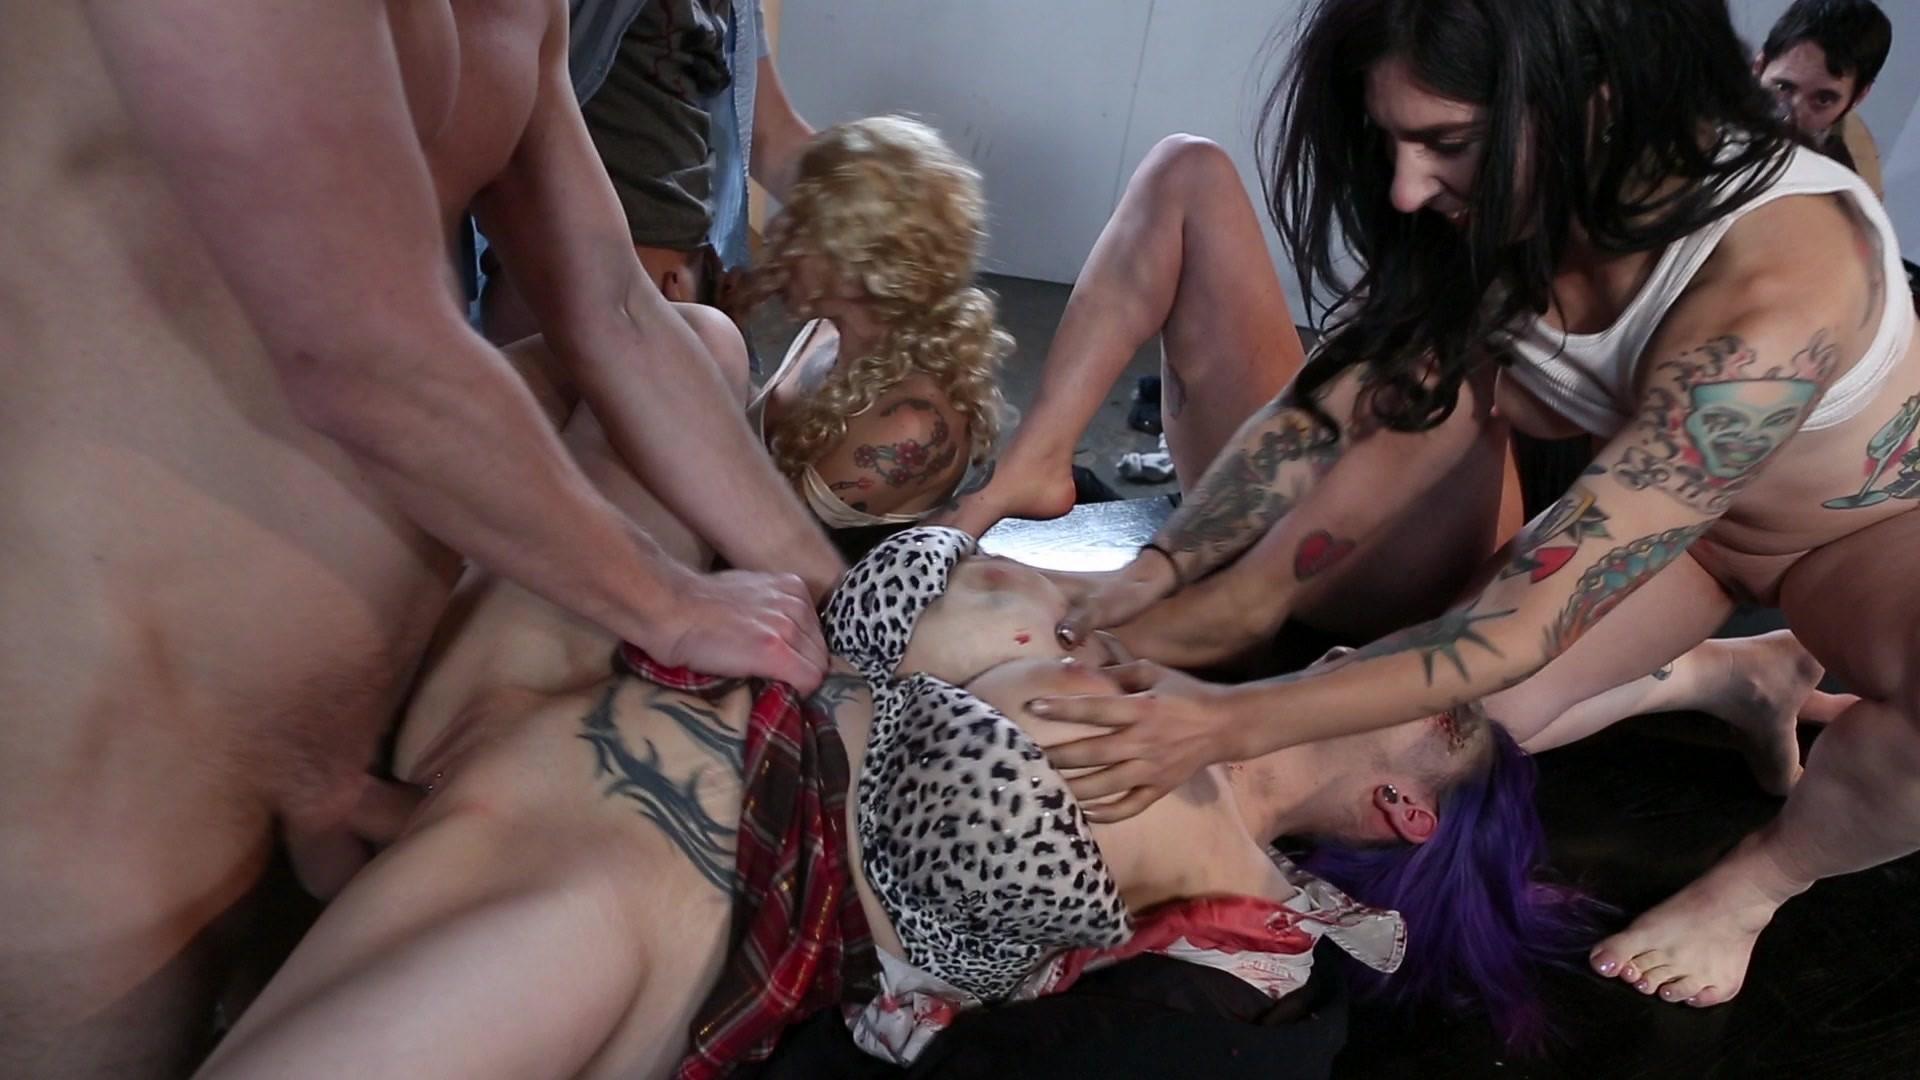 Hardcore Sex Scene In Serbia Image